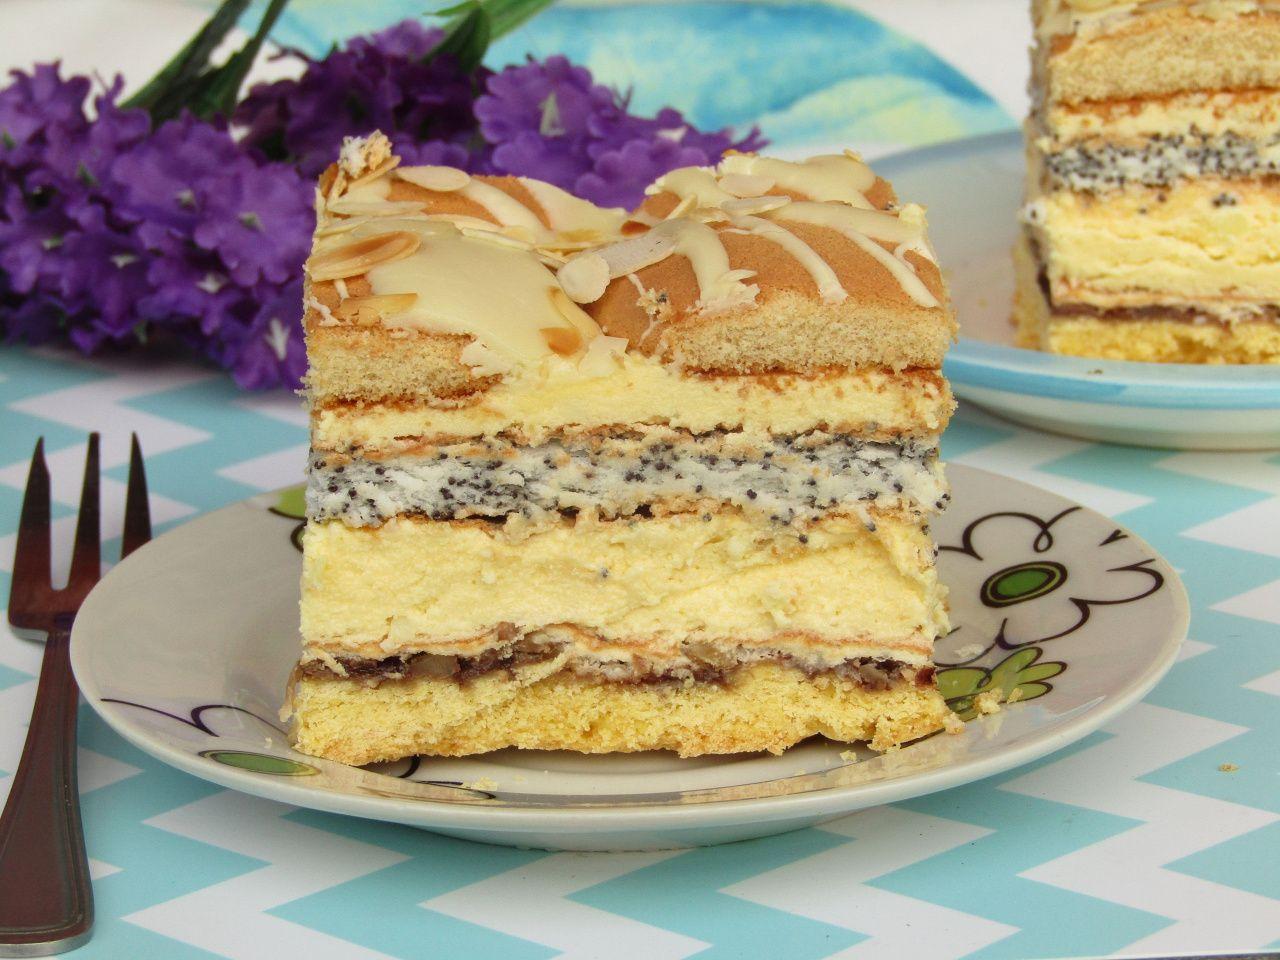 Ciasto Prasnalowe Recipe Baking Cake Recipes Polish Cake Recipe